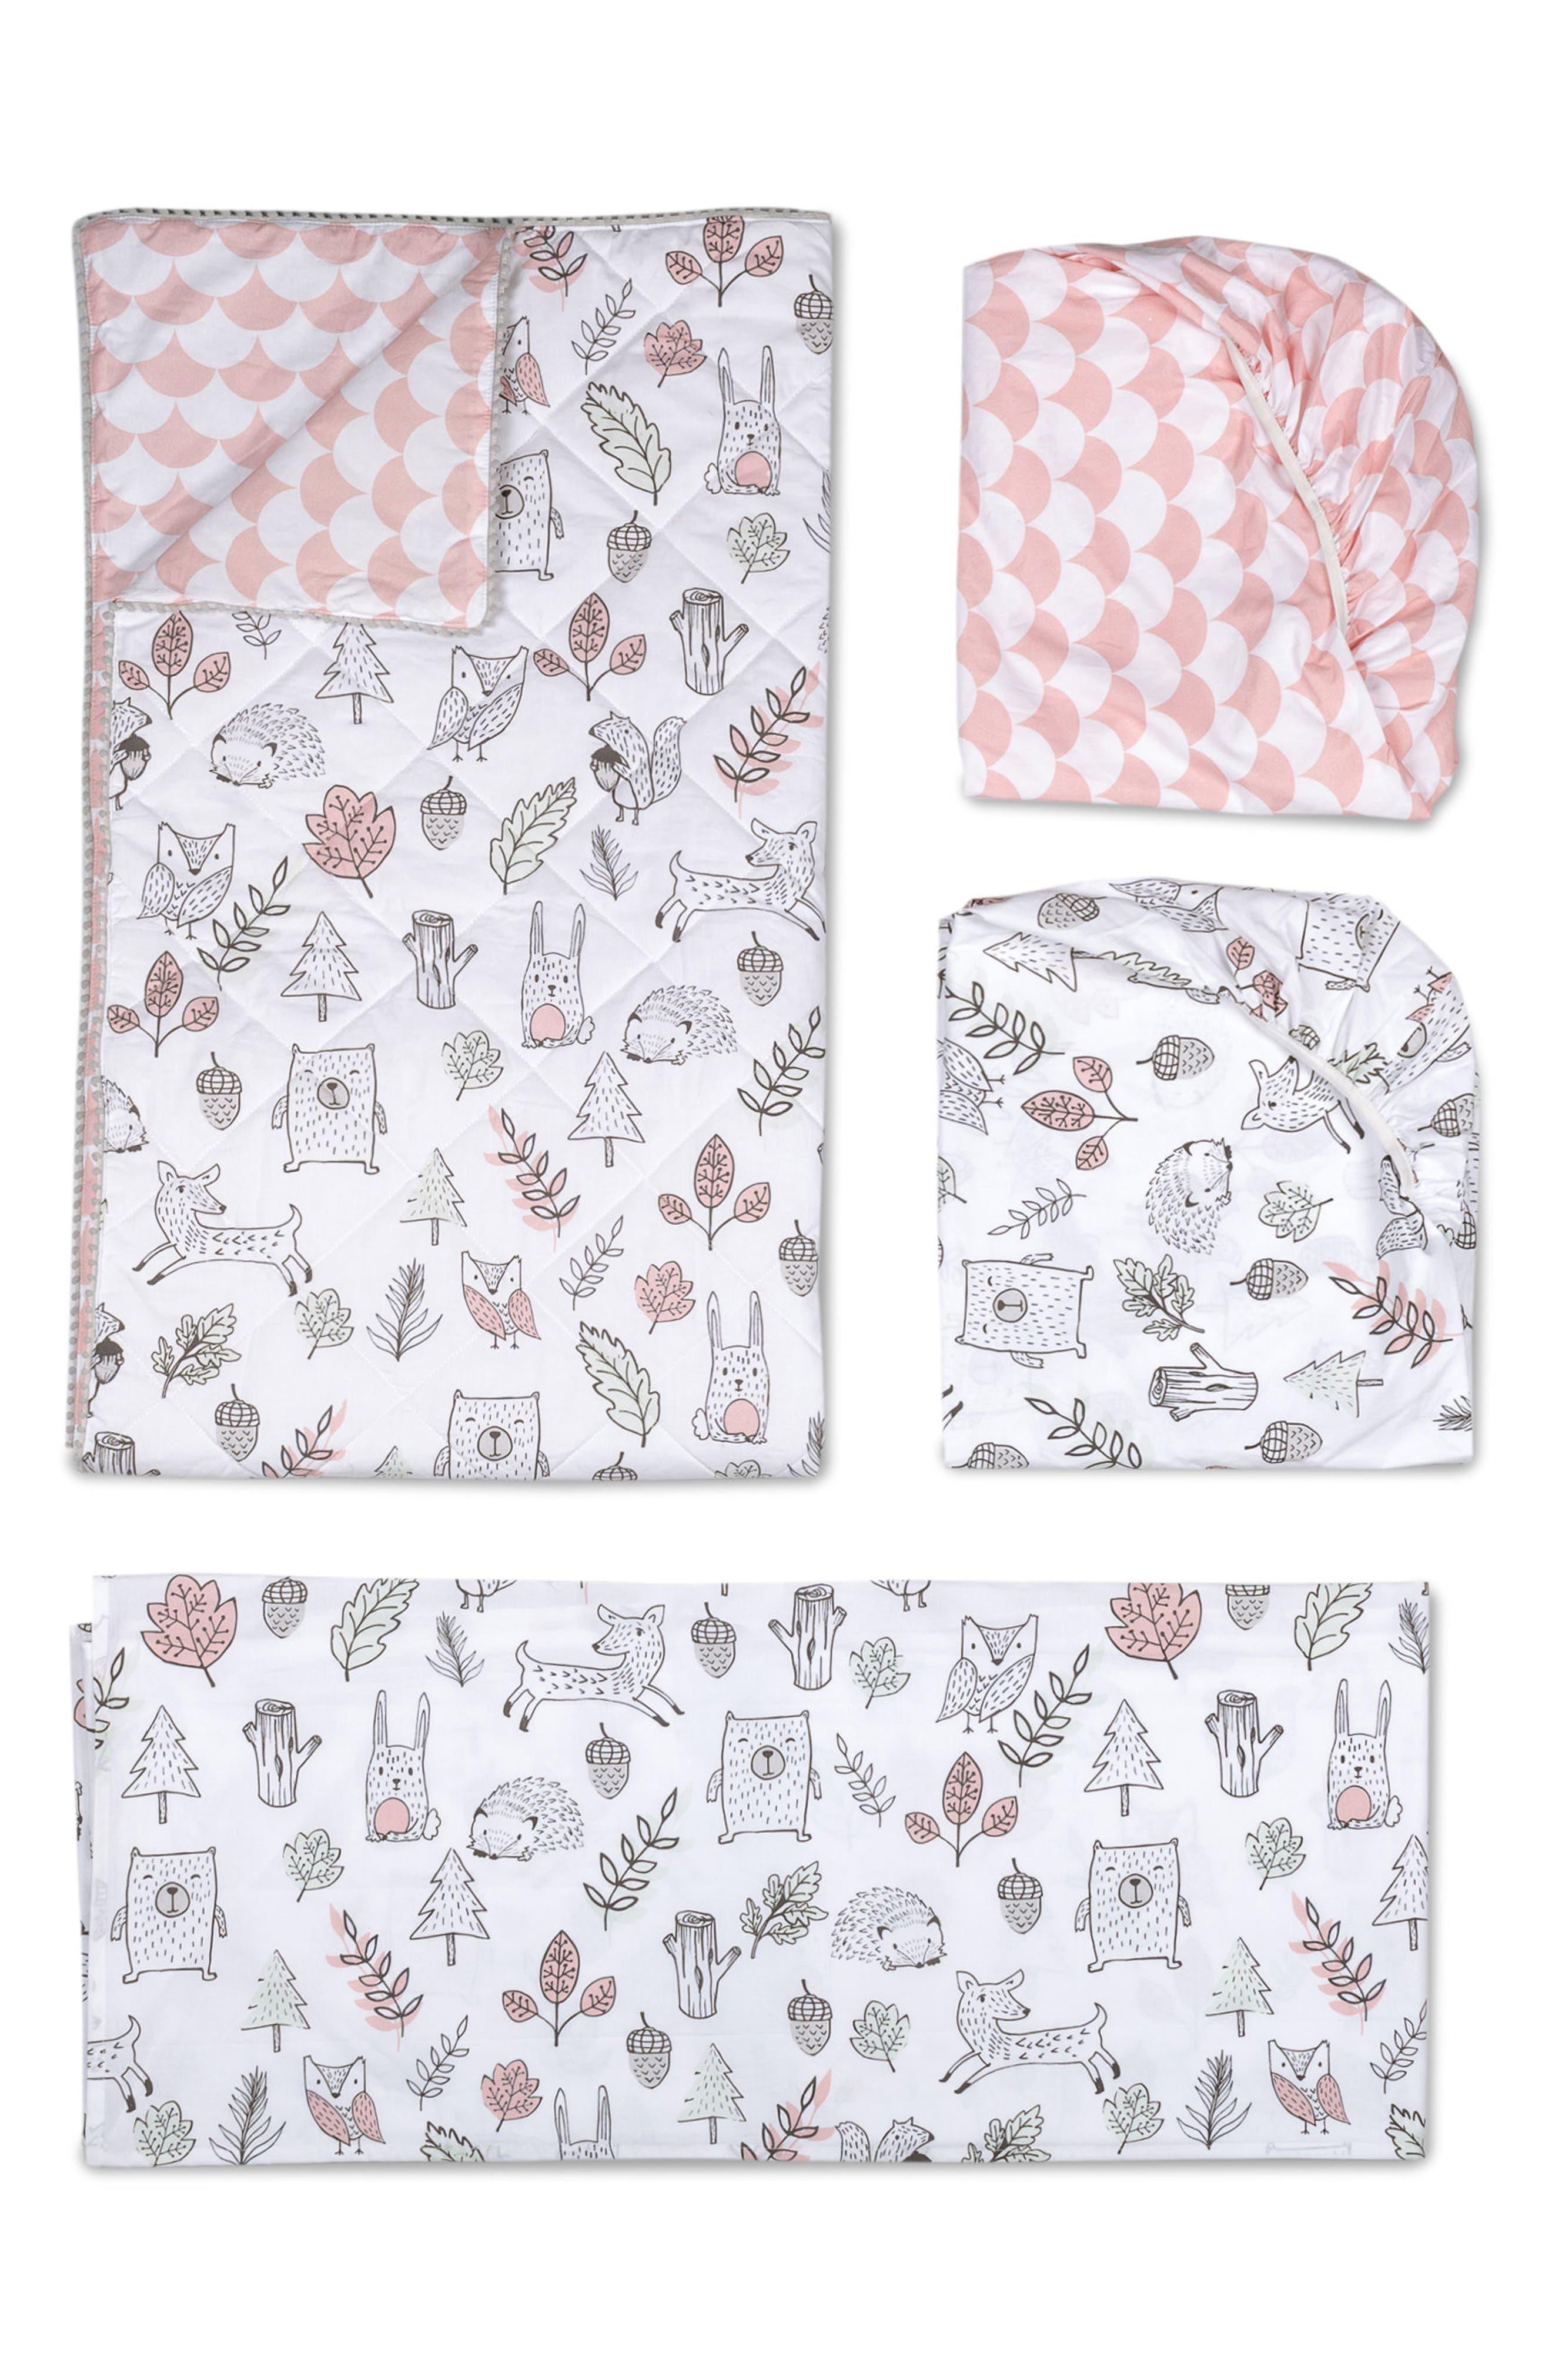 Woodlands 4-Piece Crib Bedding Set,                             Main thumbnail 1, color,                             KAYDEN - WOODLANDS